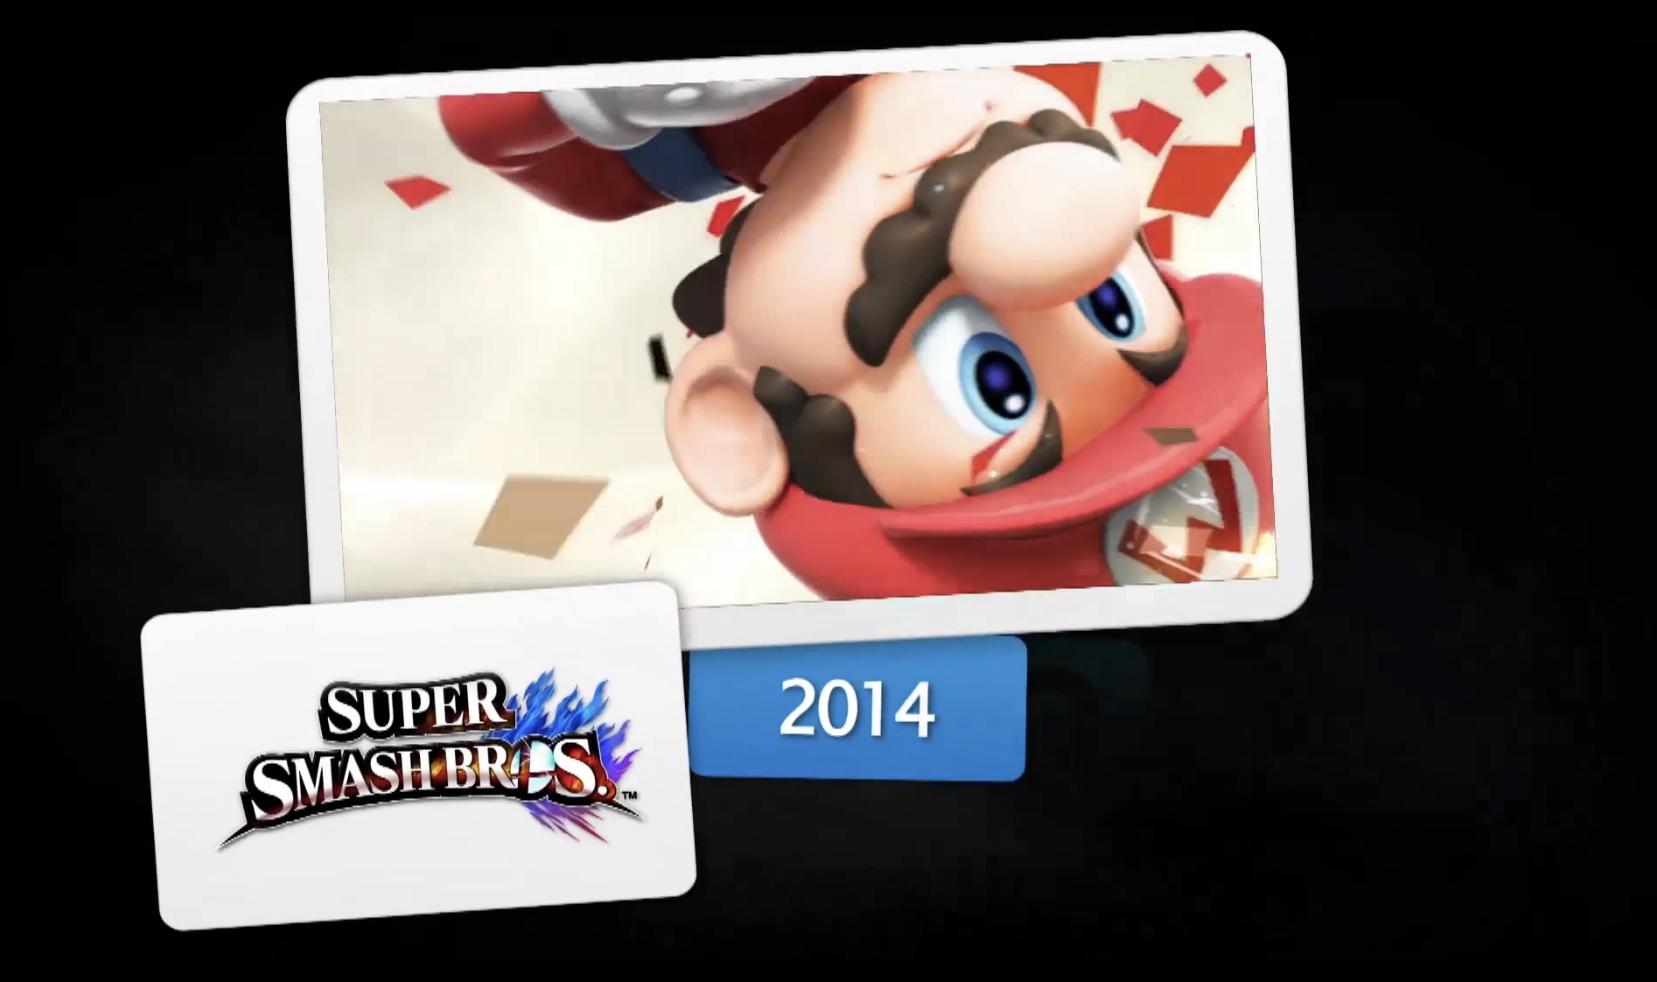 New Wii U marketing video finally gets the job done